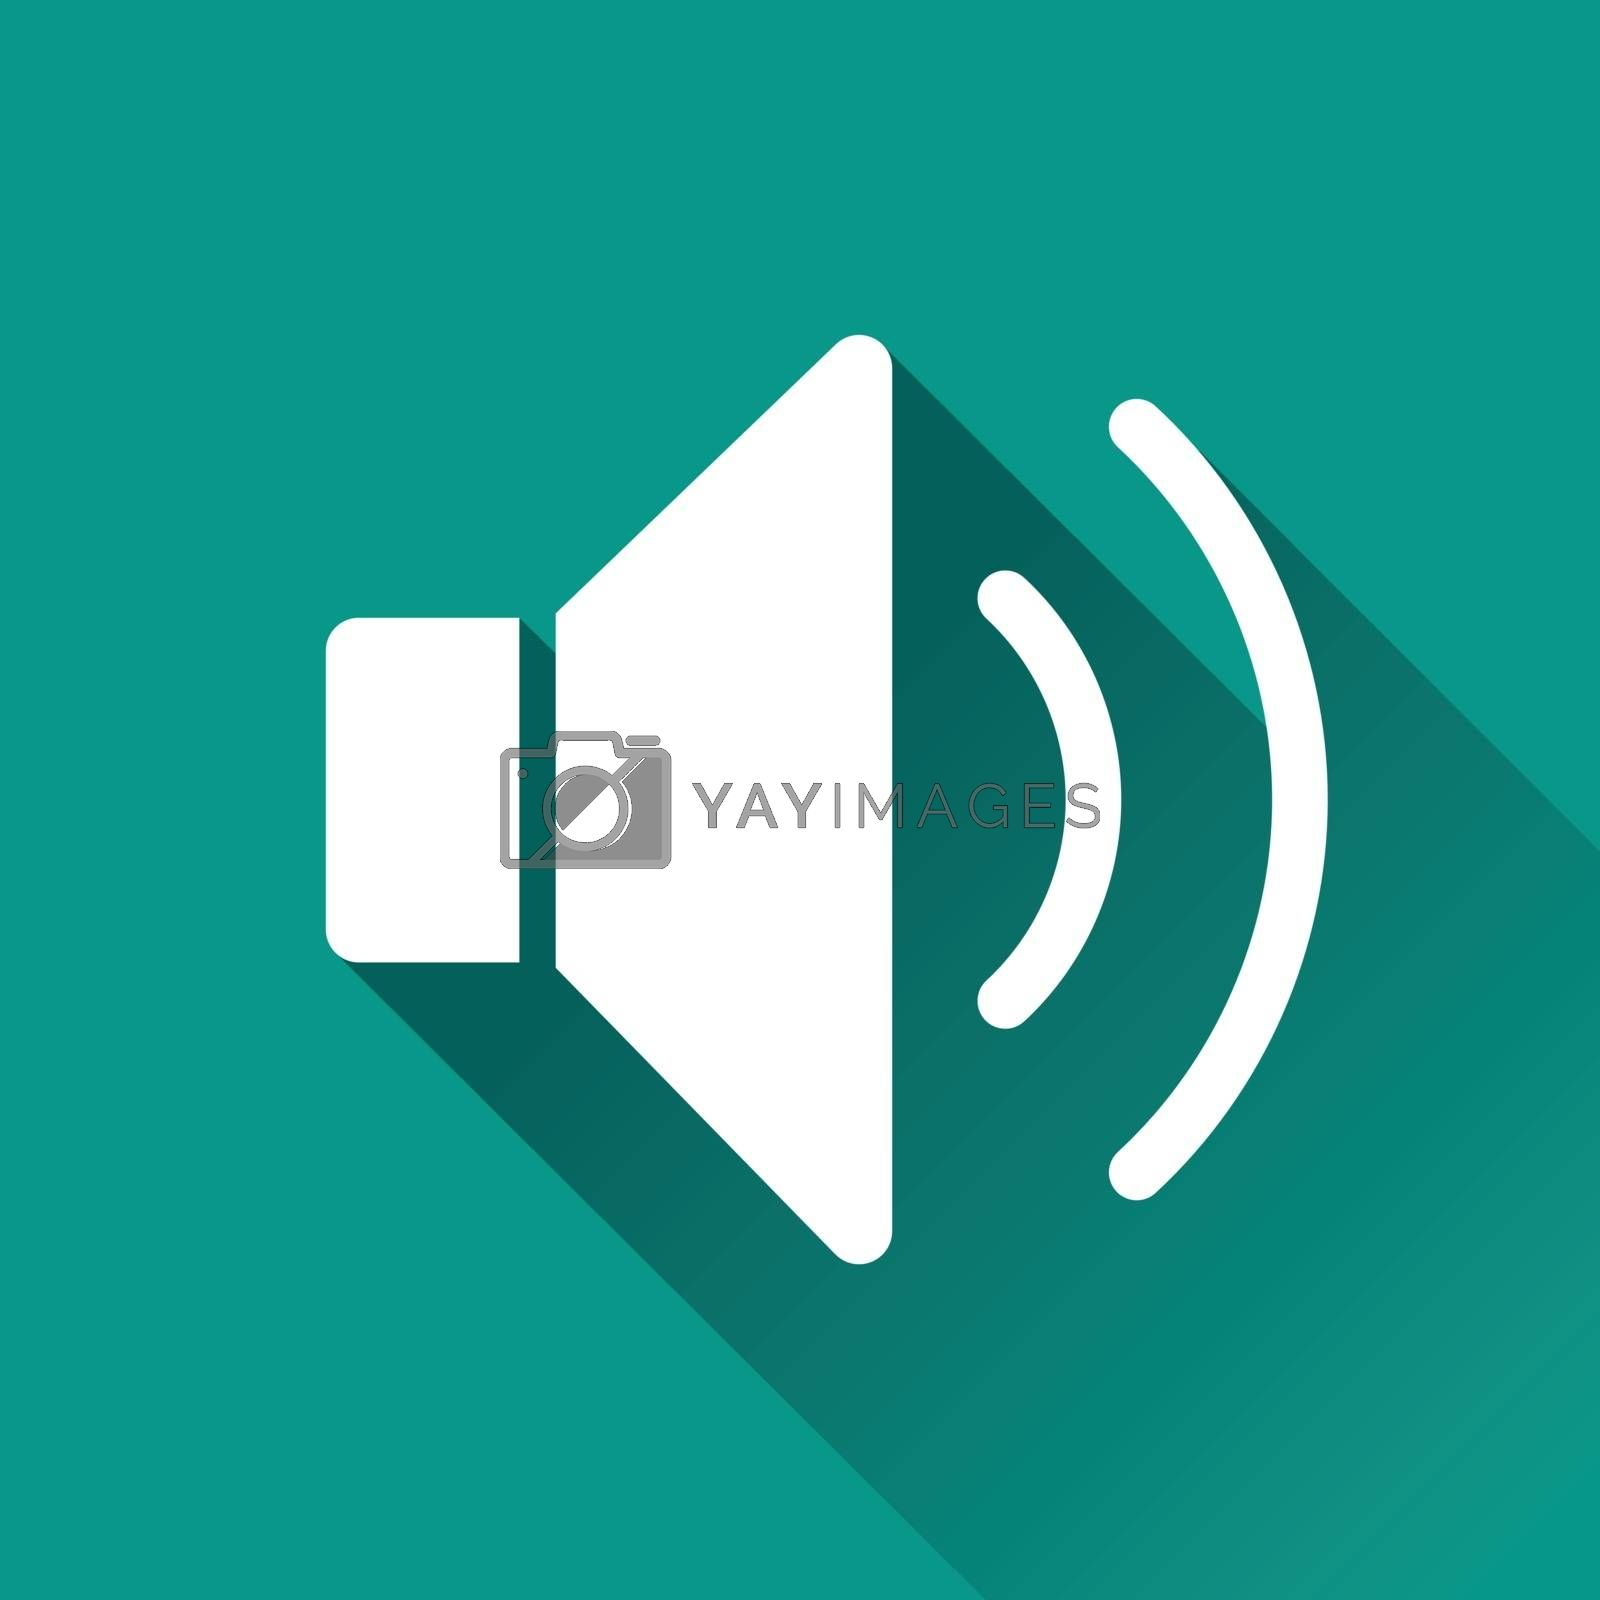 Royalty free image of sound flat design icon by nickylarson974